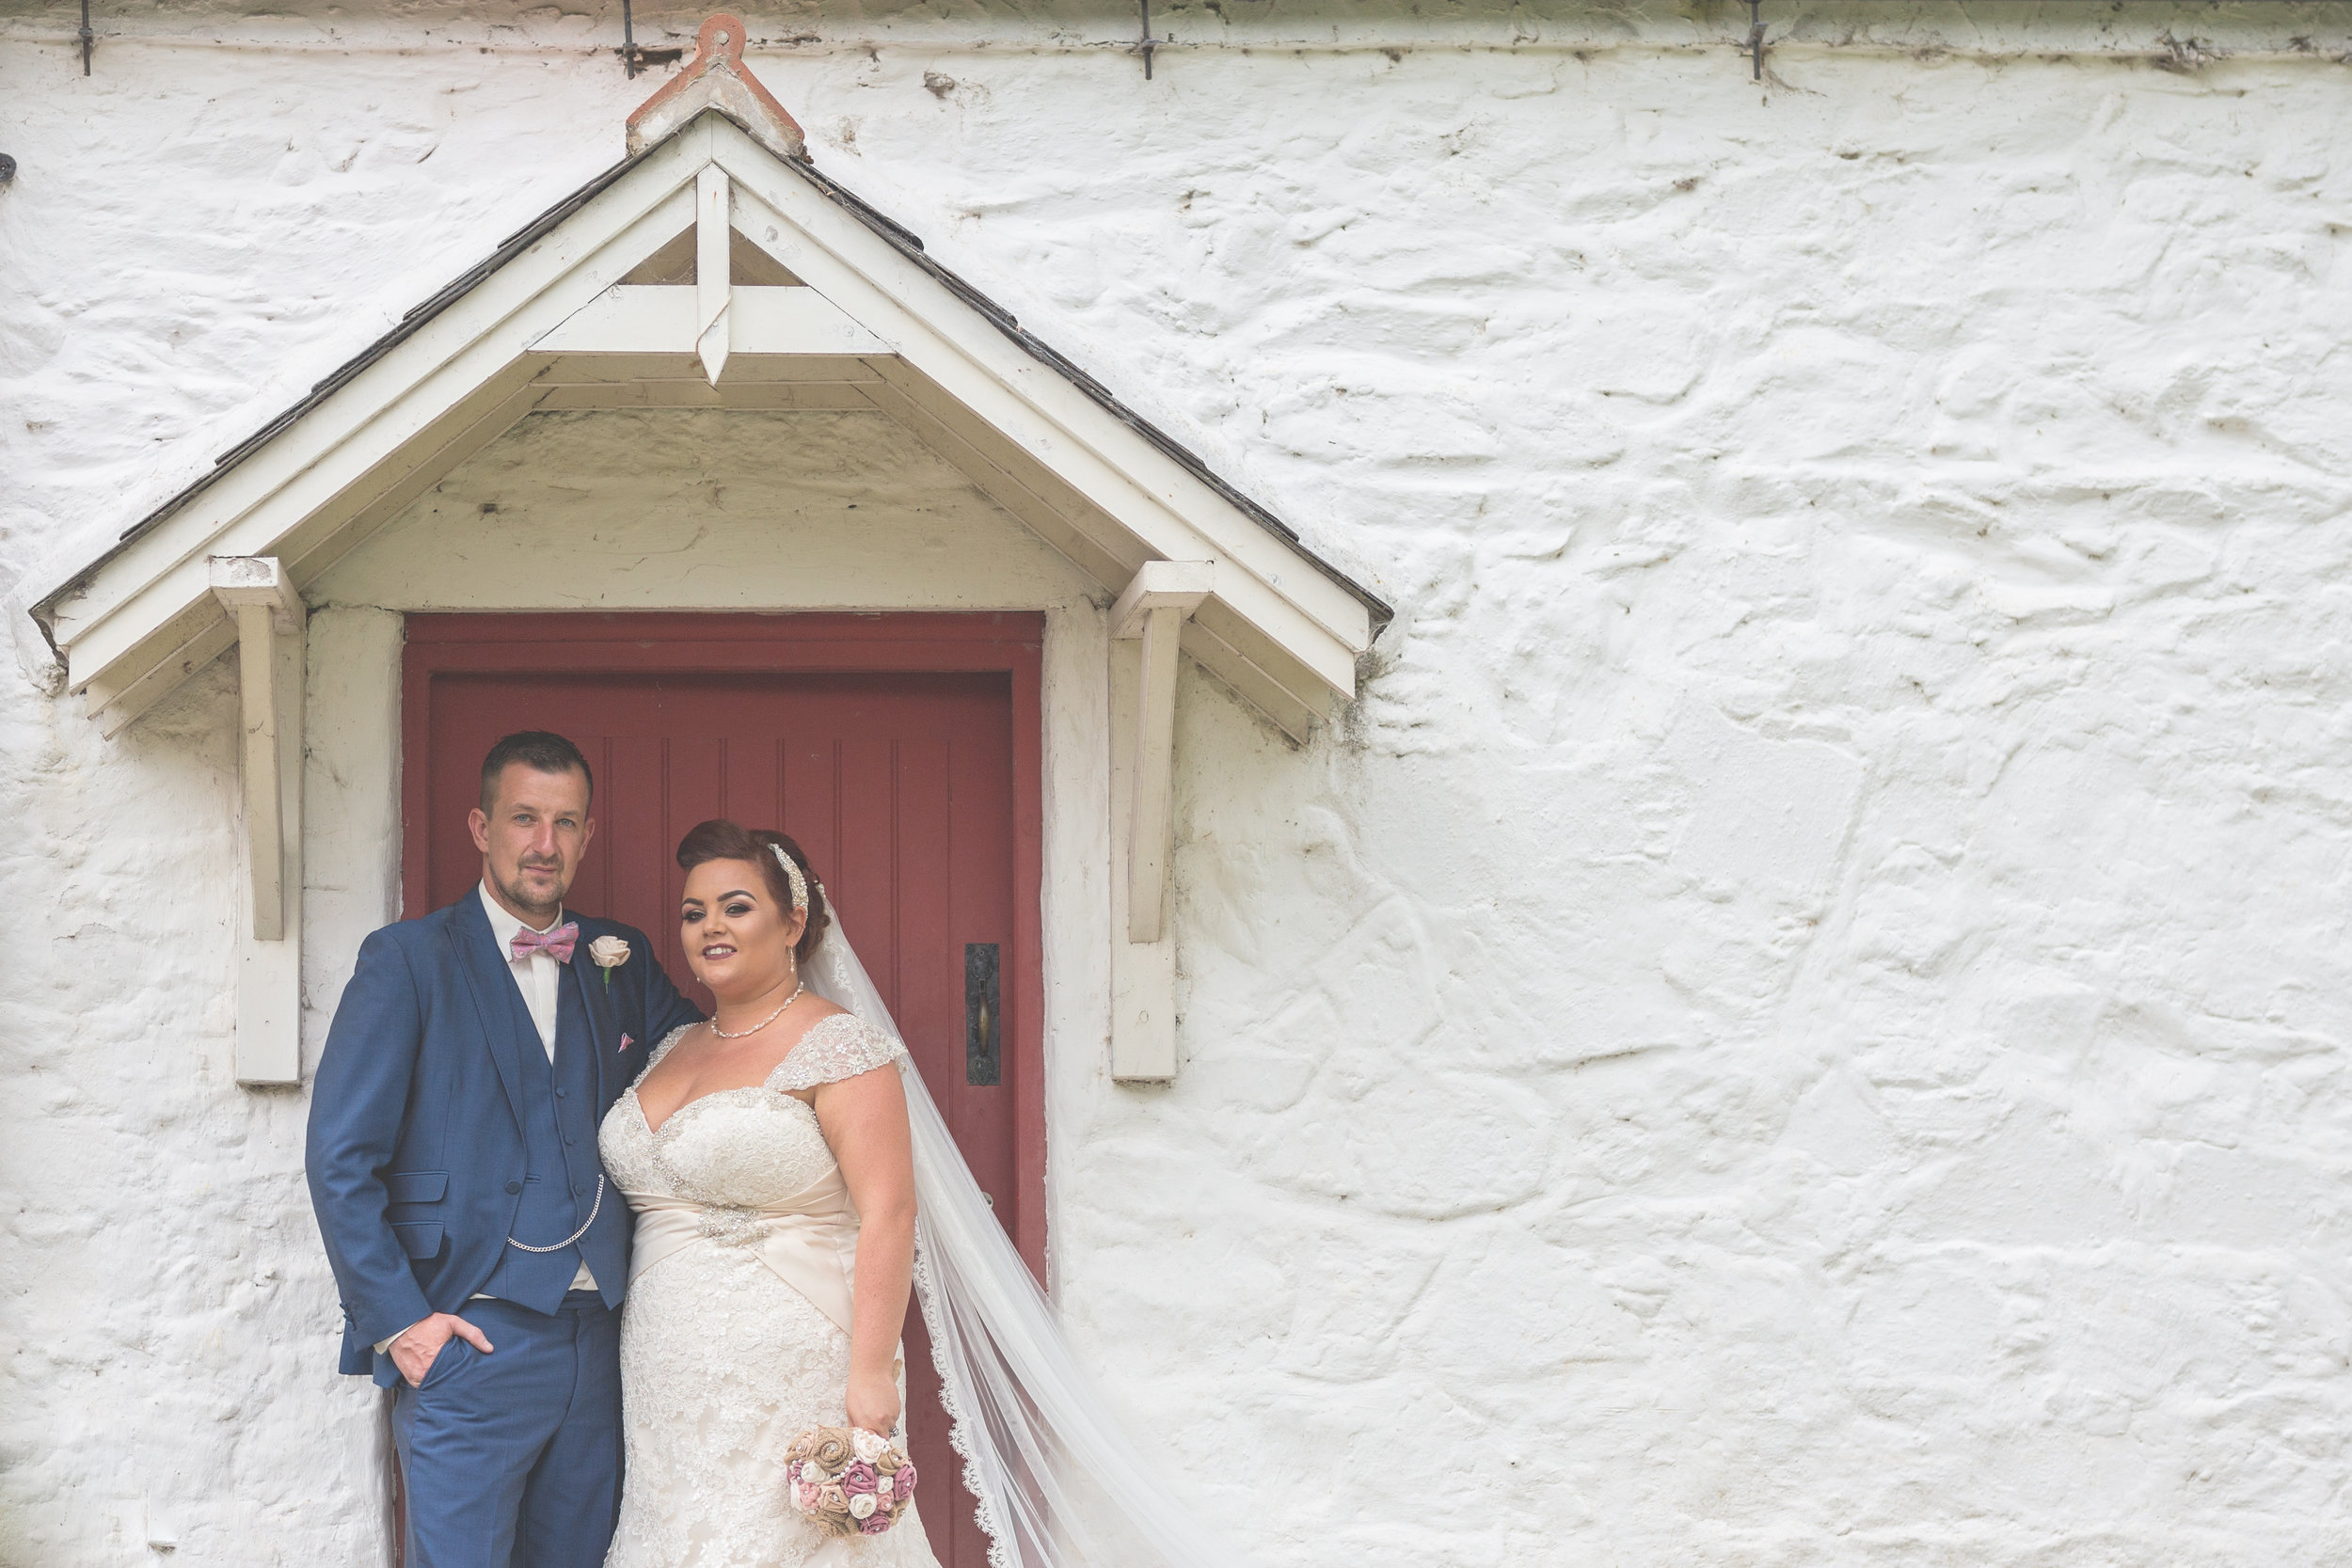 Antoinette & Stephen - Portraits   Brian McEwan Photography   Wedding Photographer Northern Ireland 5.jpg